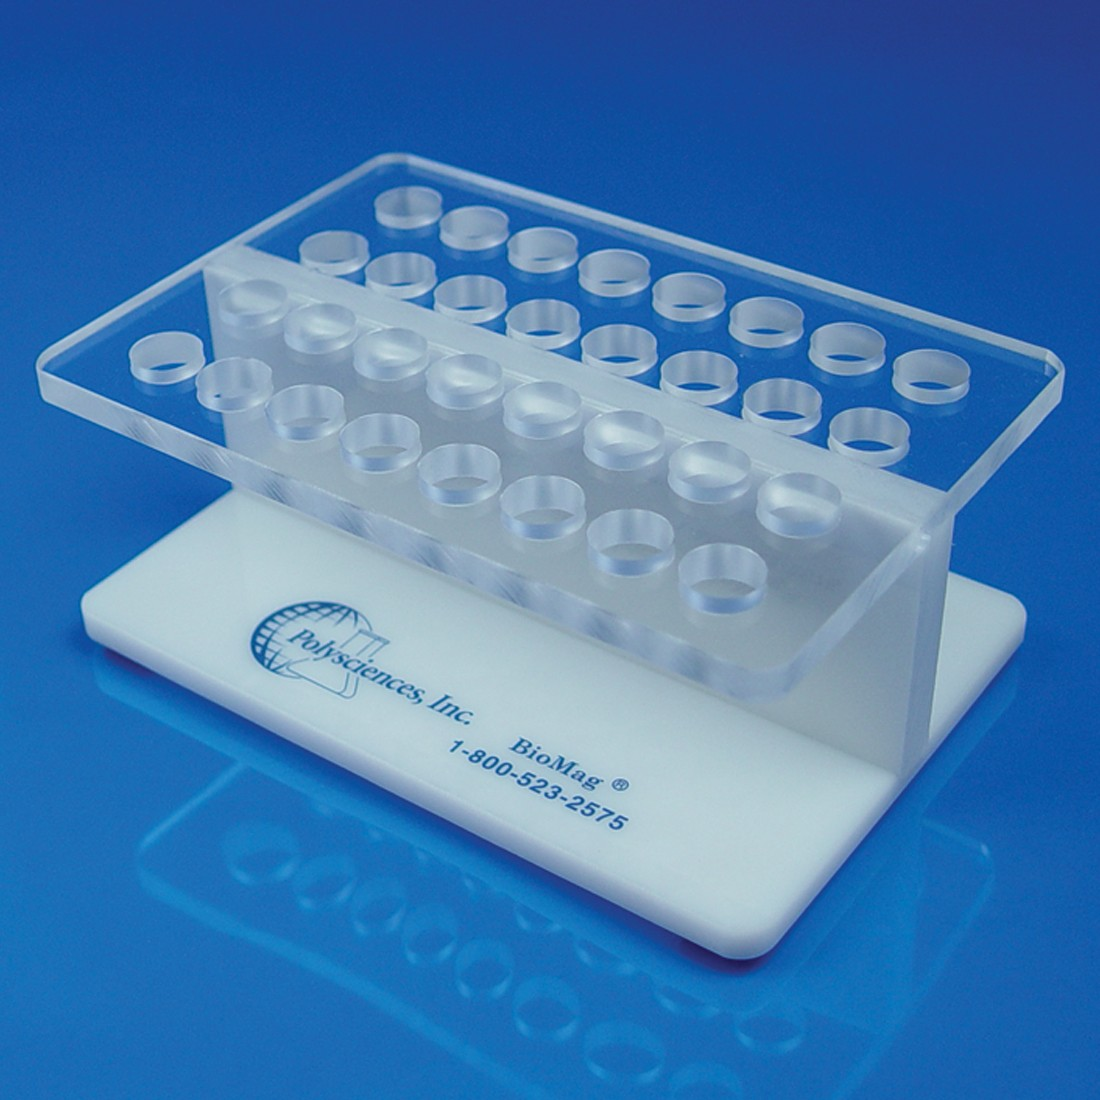 BioMag® Multi-32 Microcentrifuge Tube Separator